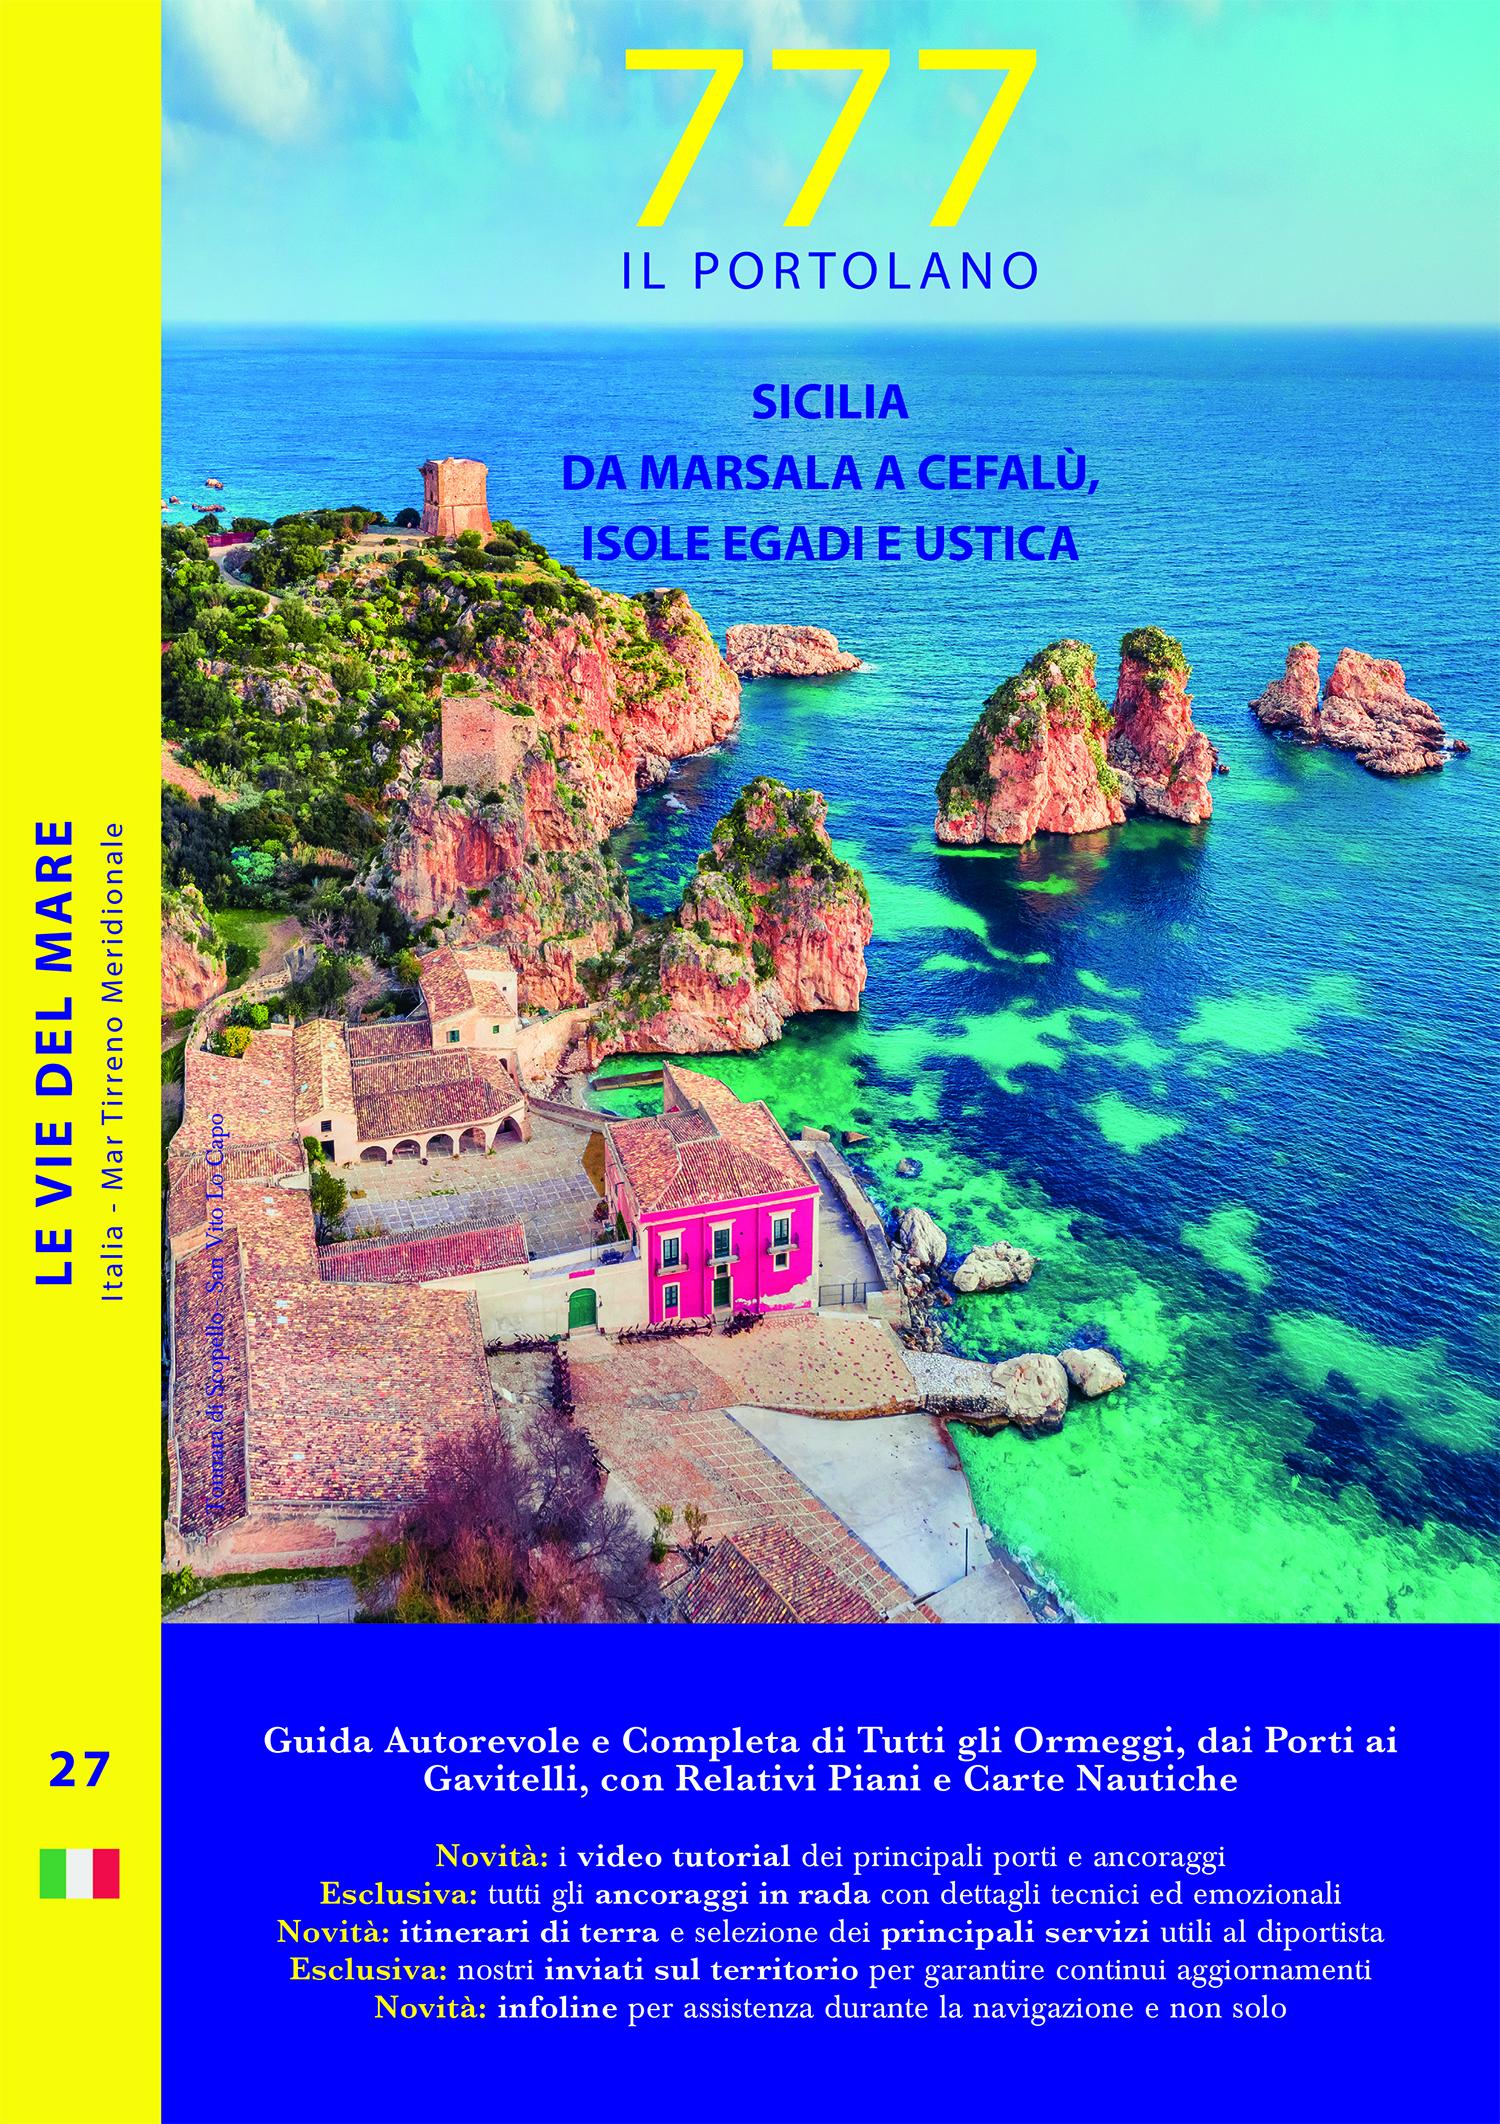 Sicilia – Da Marsala a Cefalu', Isole Egadi e Ustica